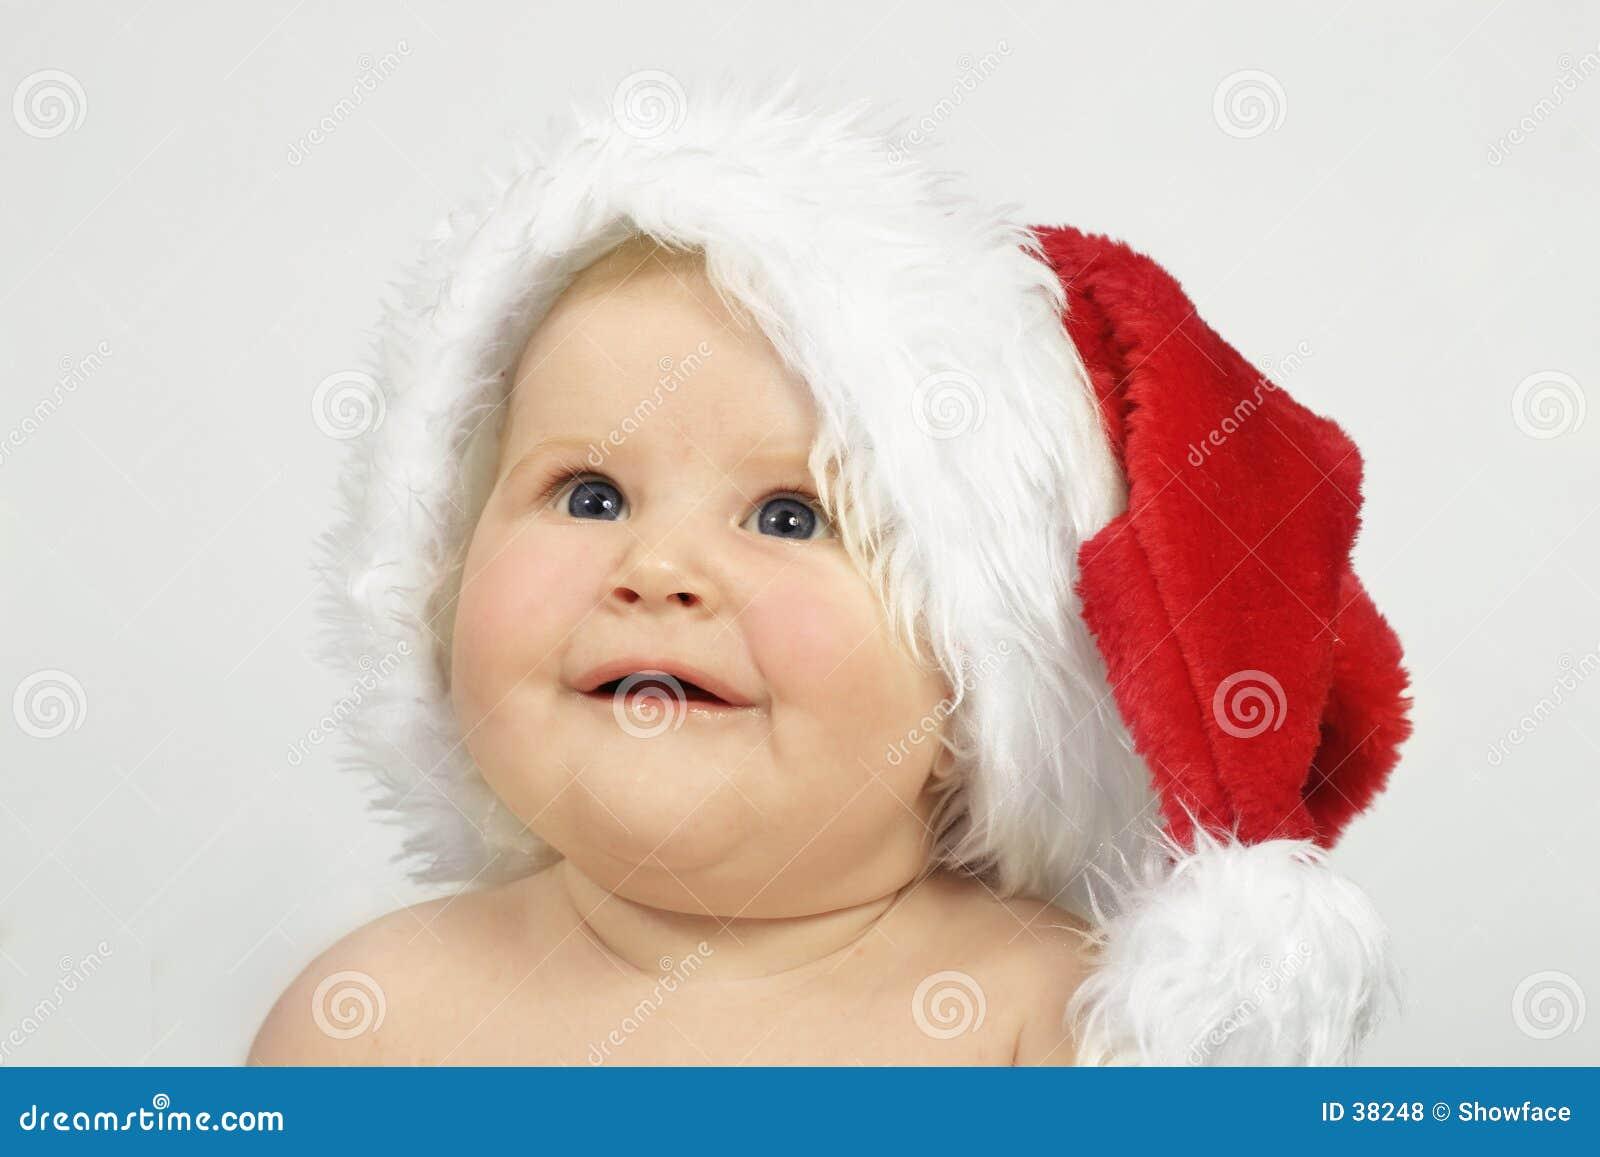 Lil s santa хелпера